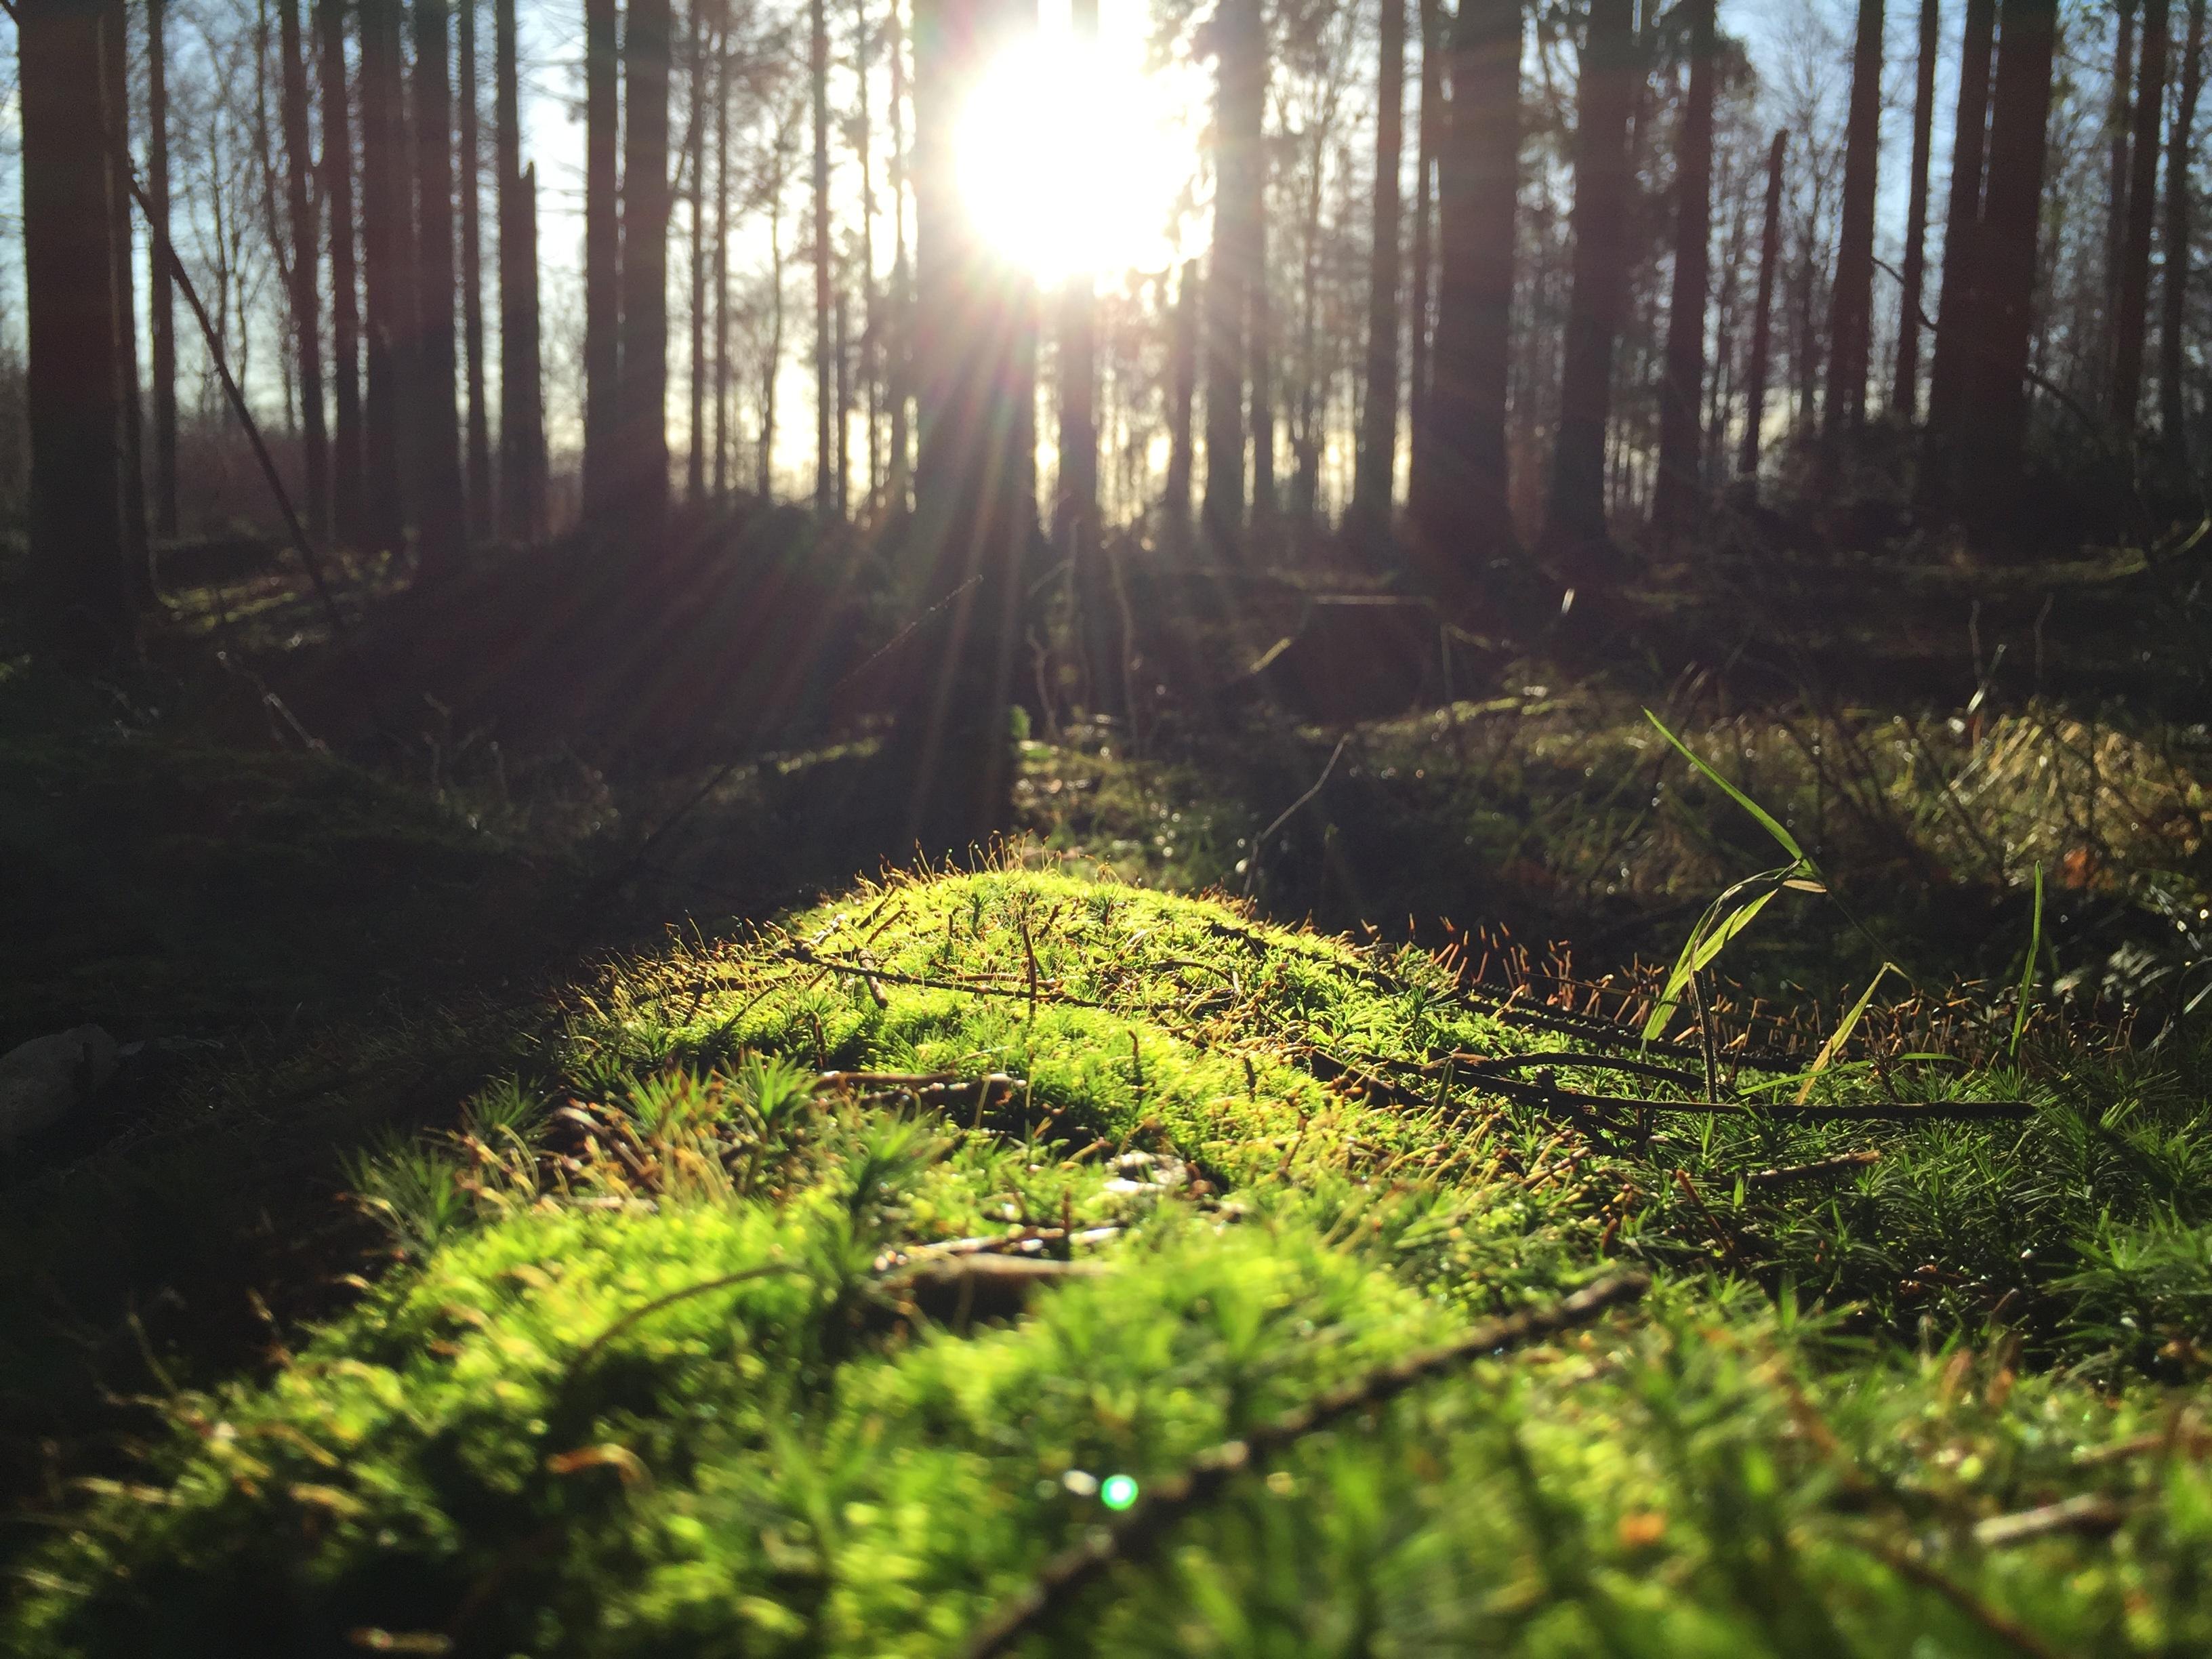 Rays hitting the grass photo